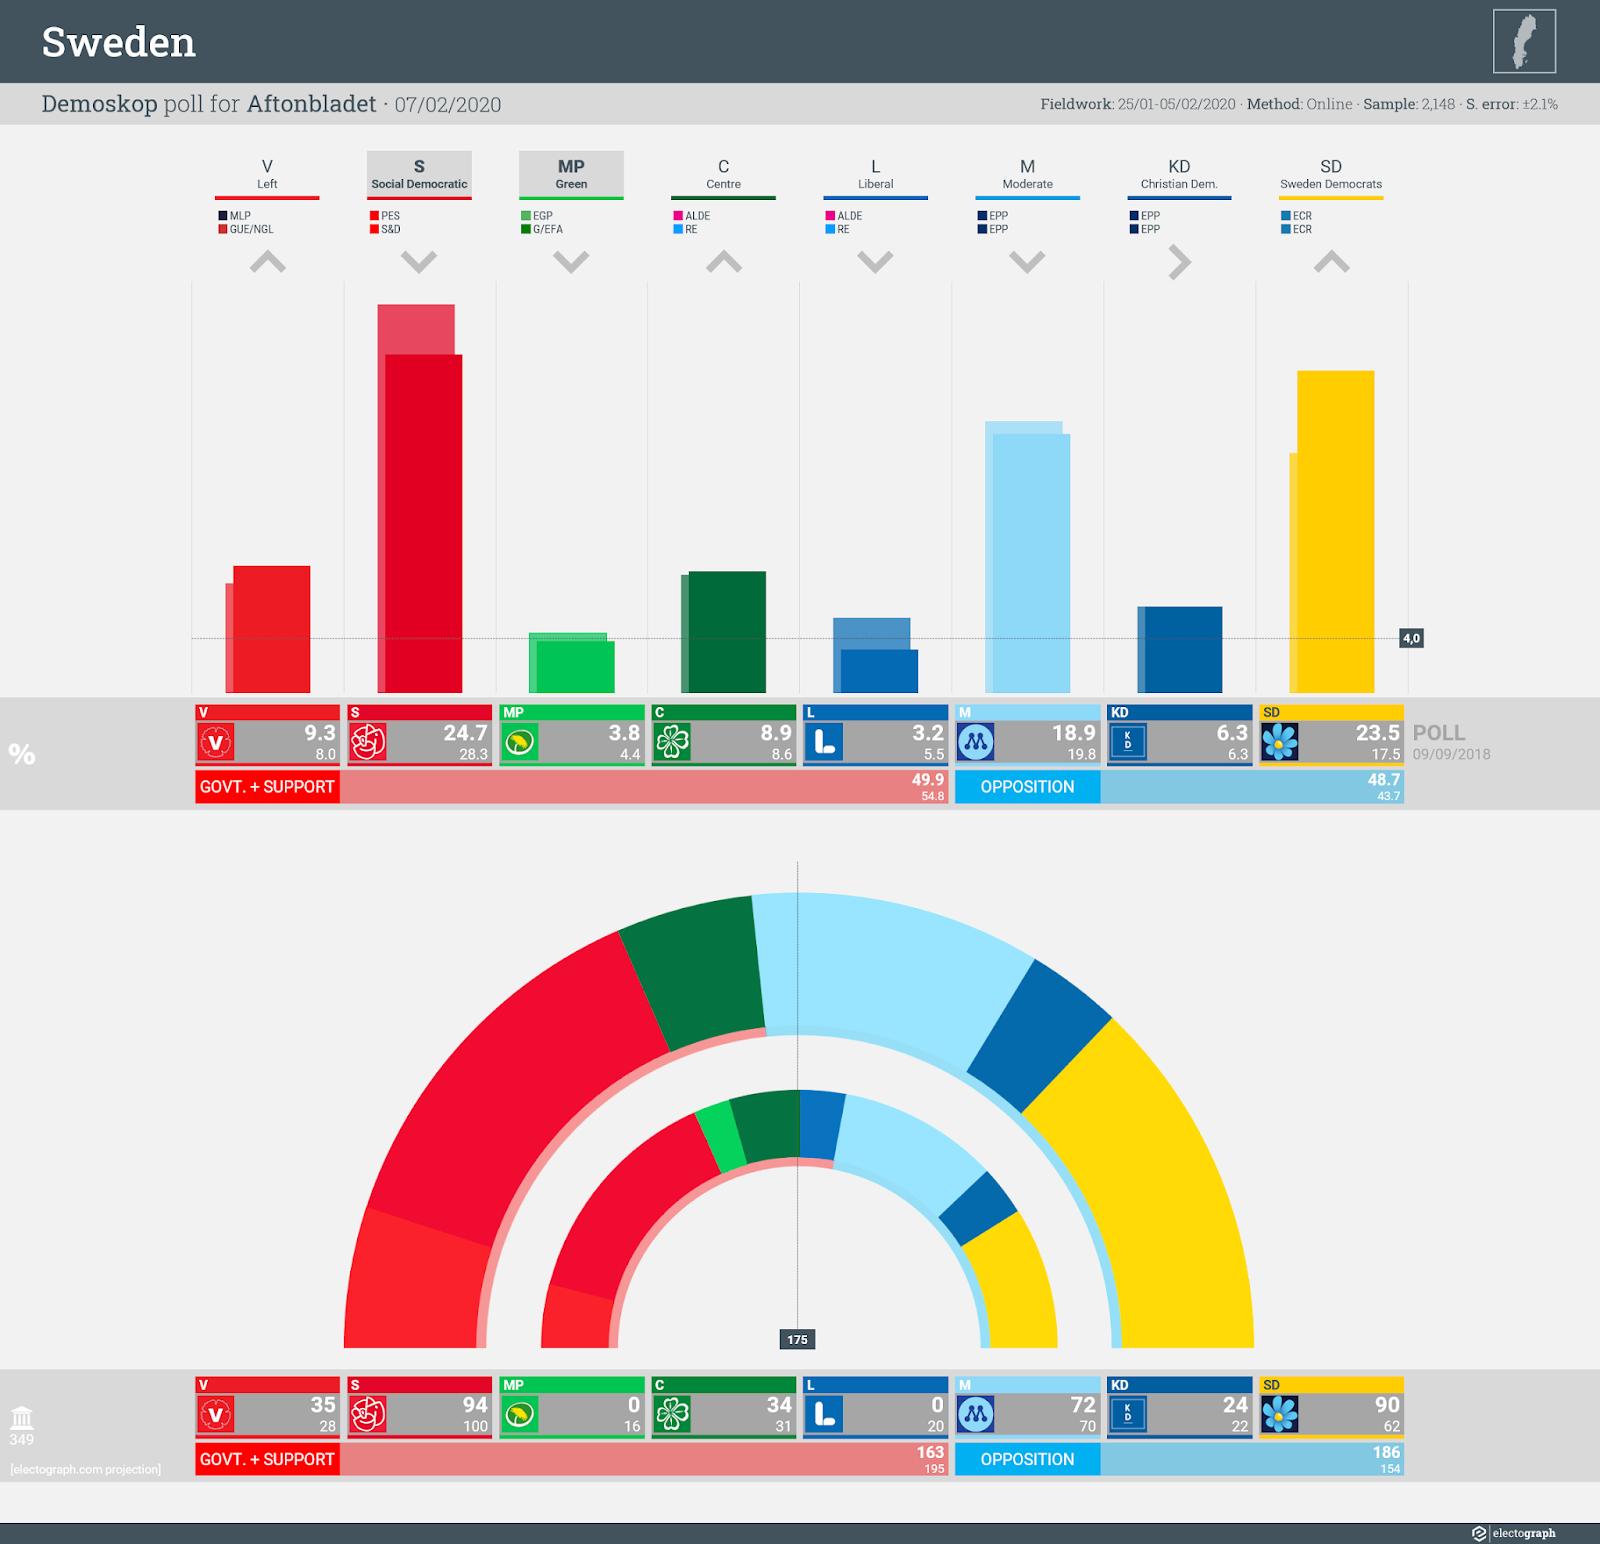 SWEDEN: Demoskop poll chart for Aftonbladet, 7 February 2020